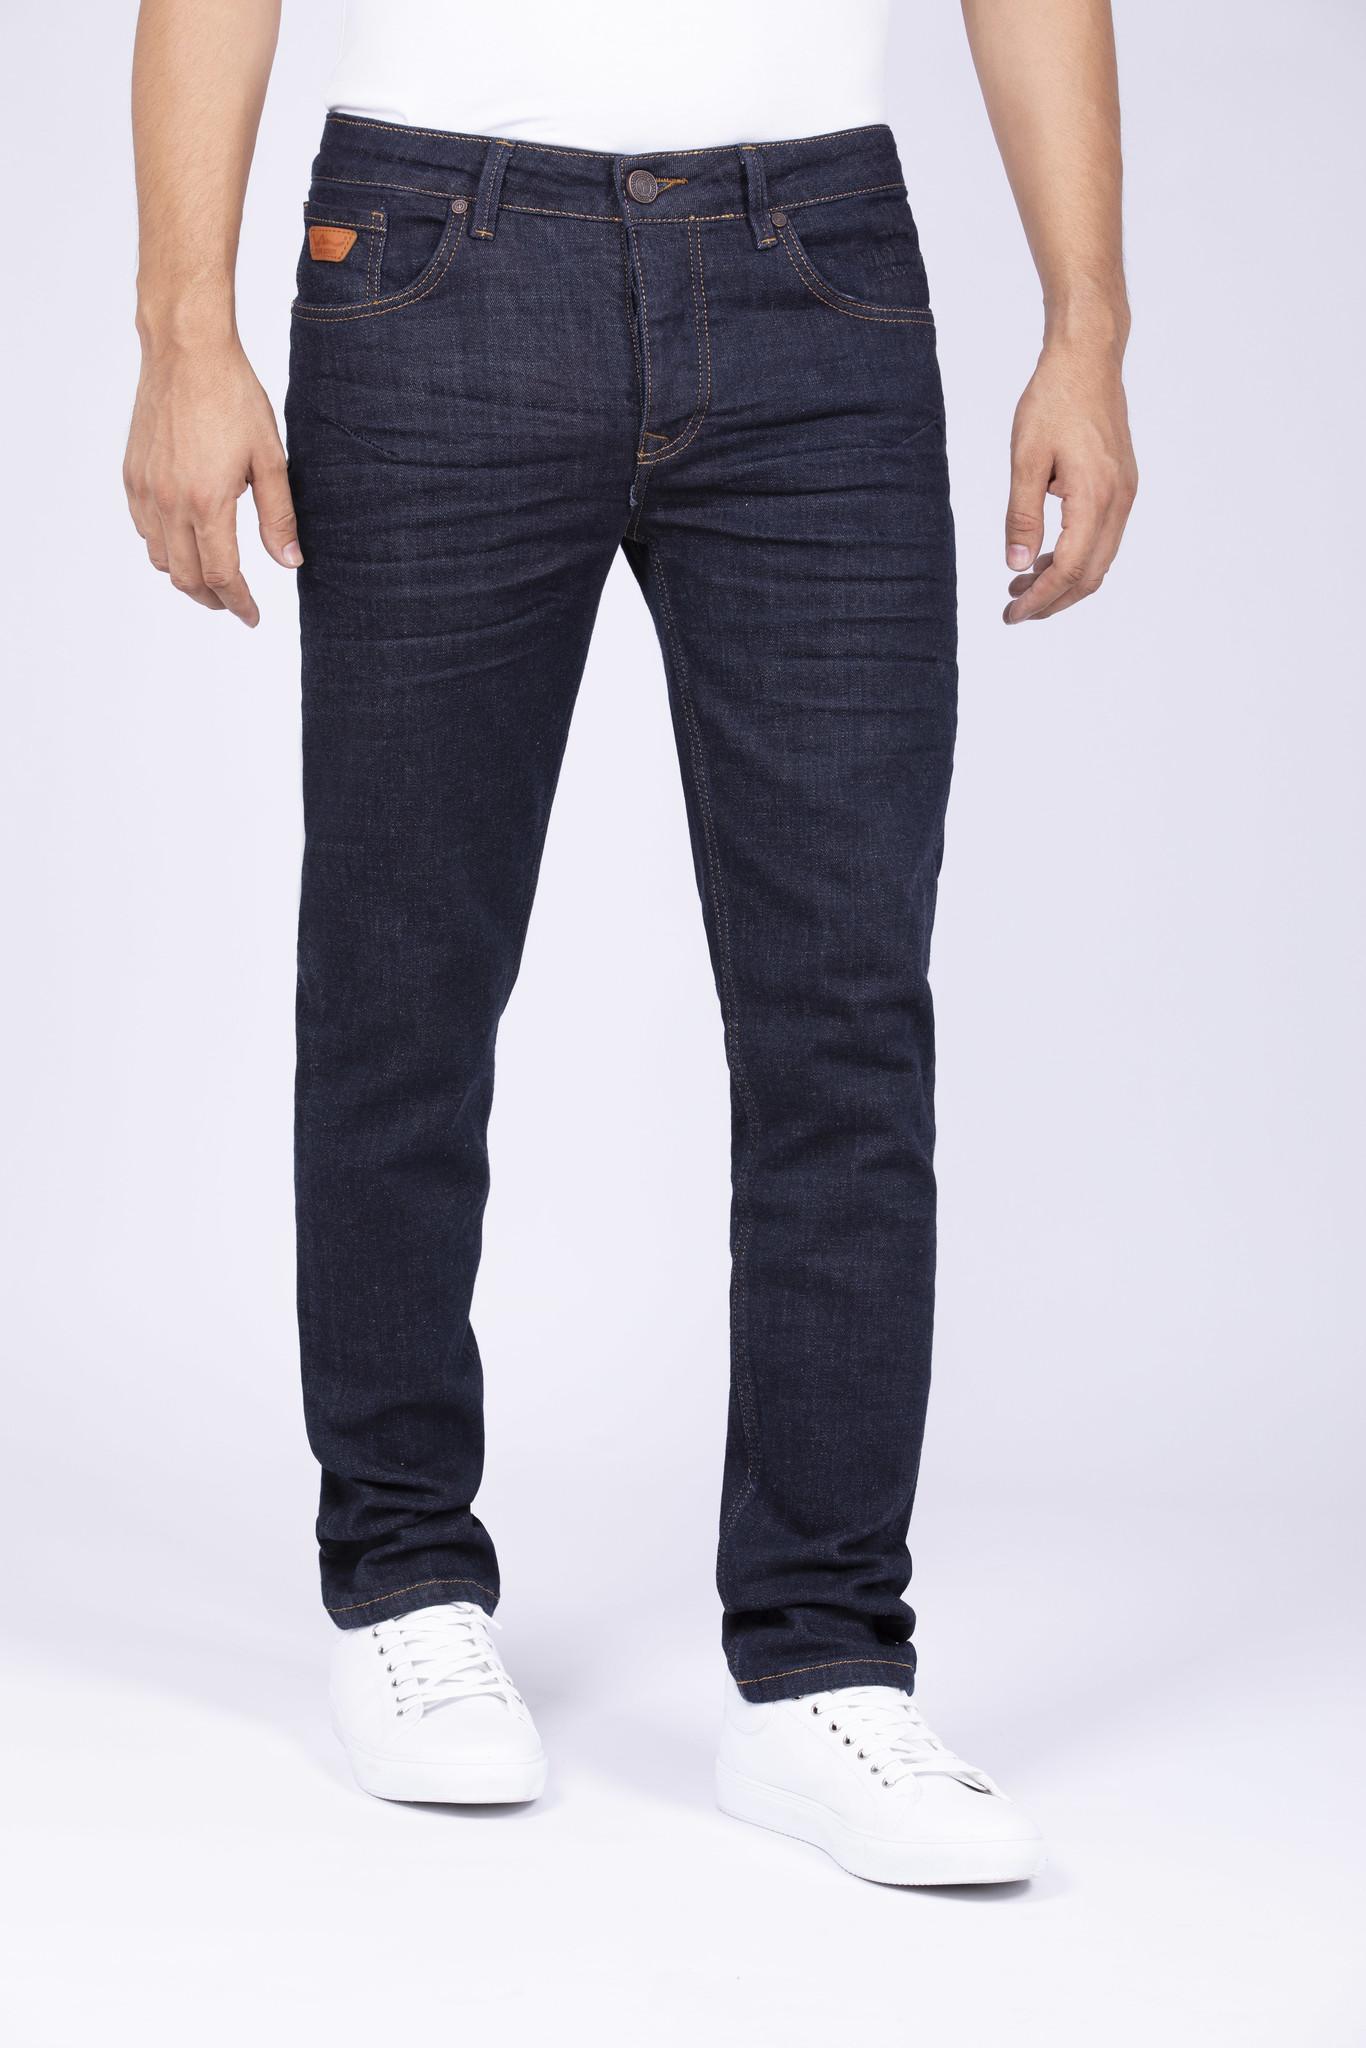 Wam Denim Jeans  38/34